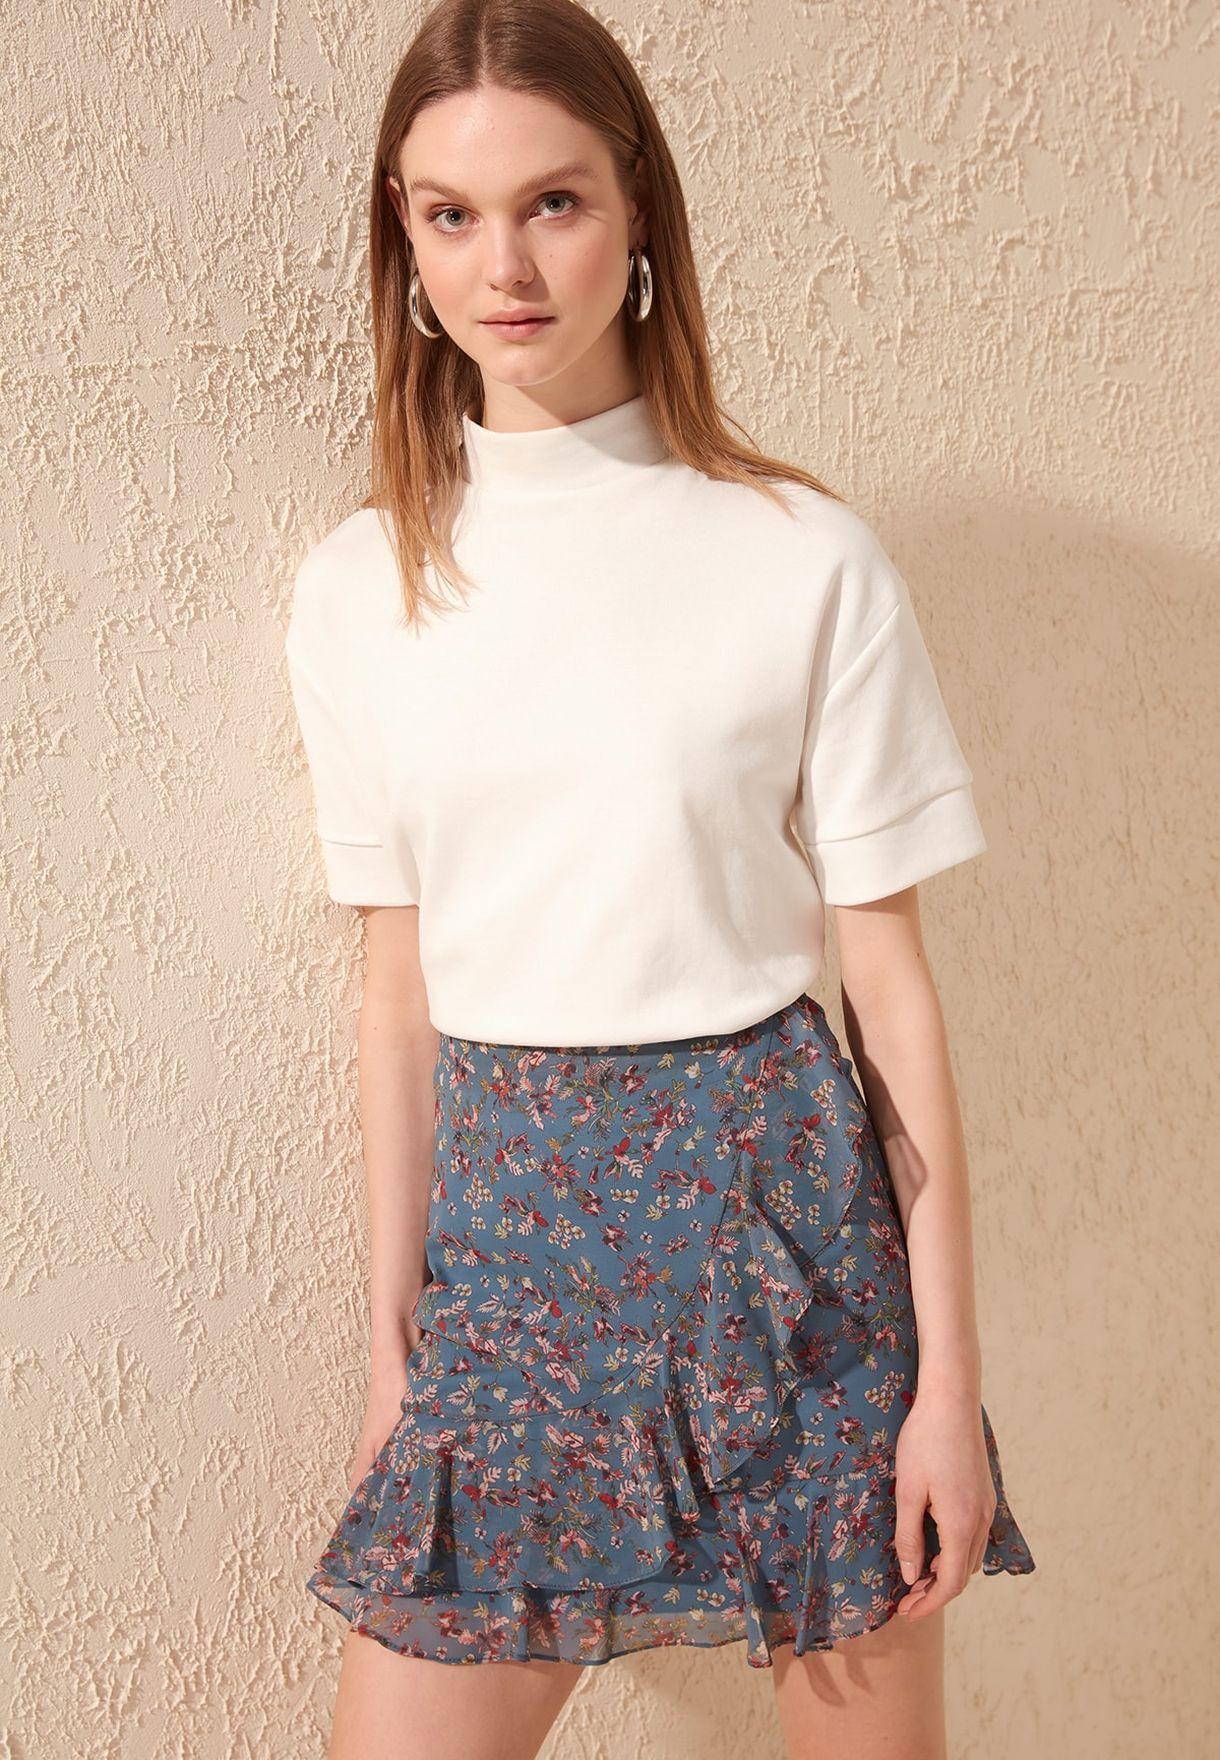 Buy Trendyol Multicolor Ruffle Trim Printed Skirt For Women, Uae 27680atwzmyp